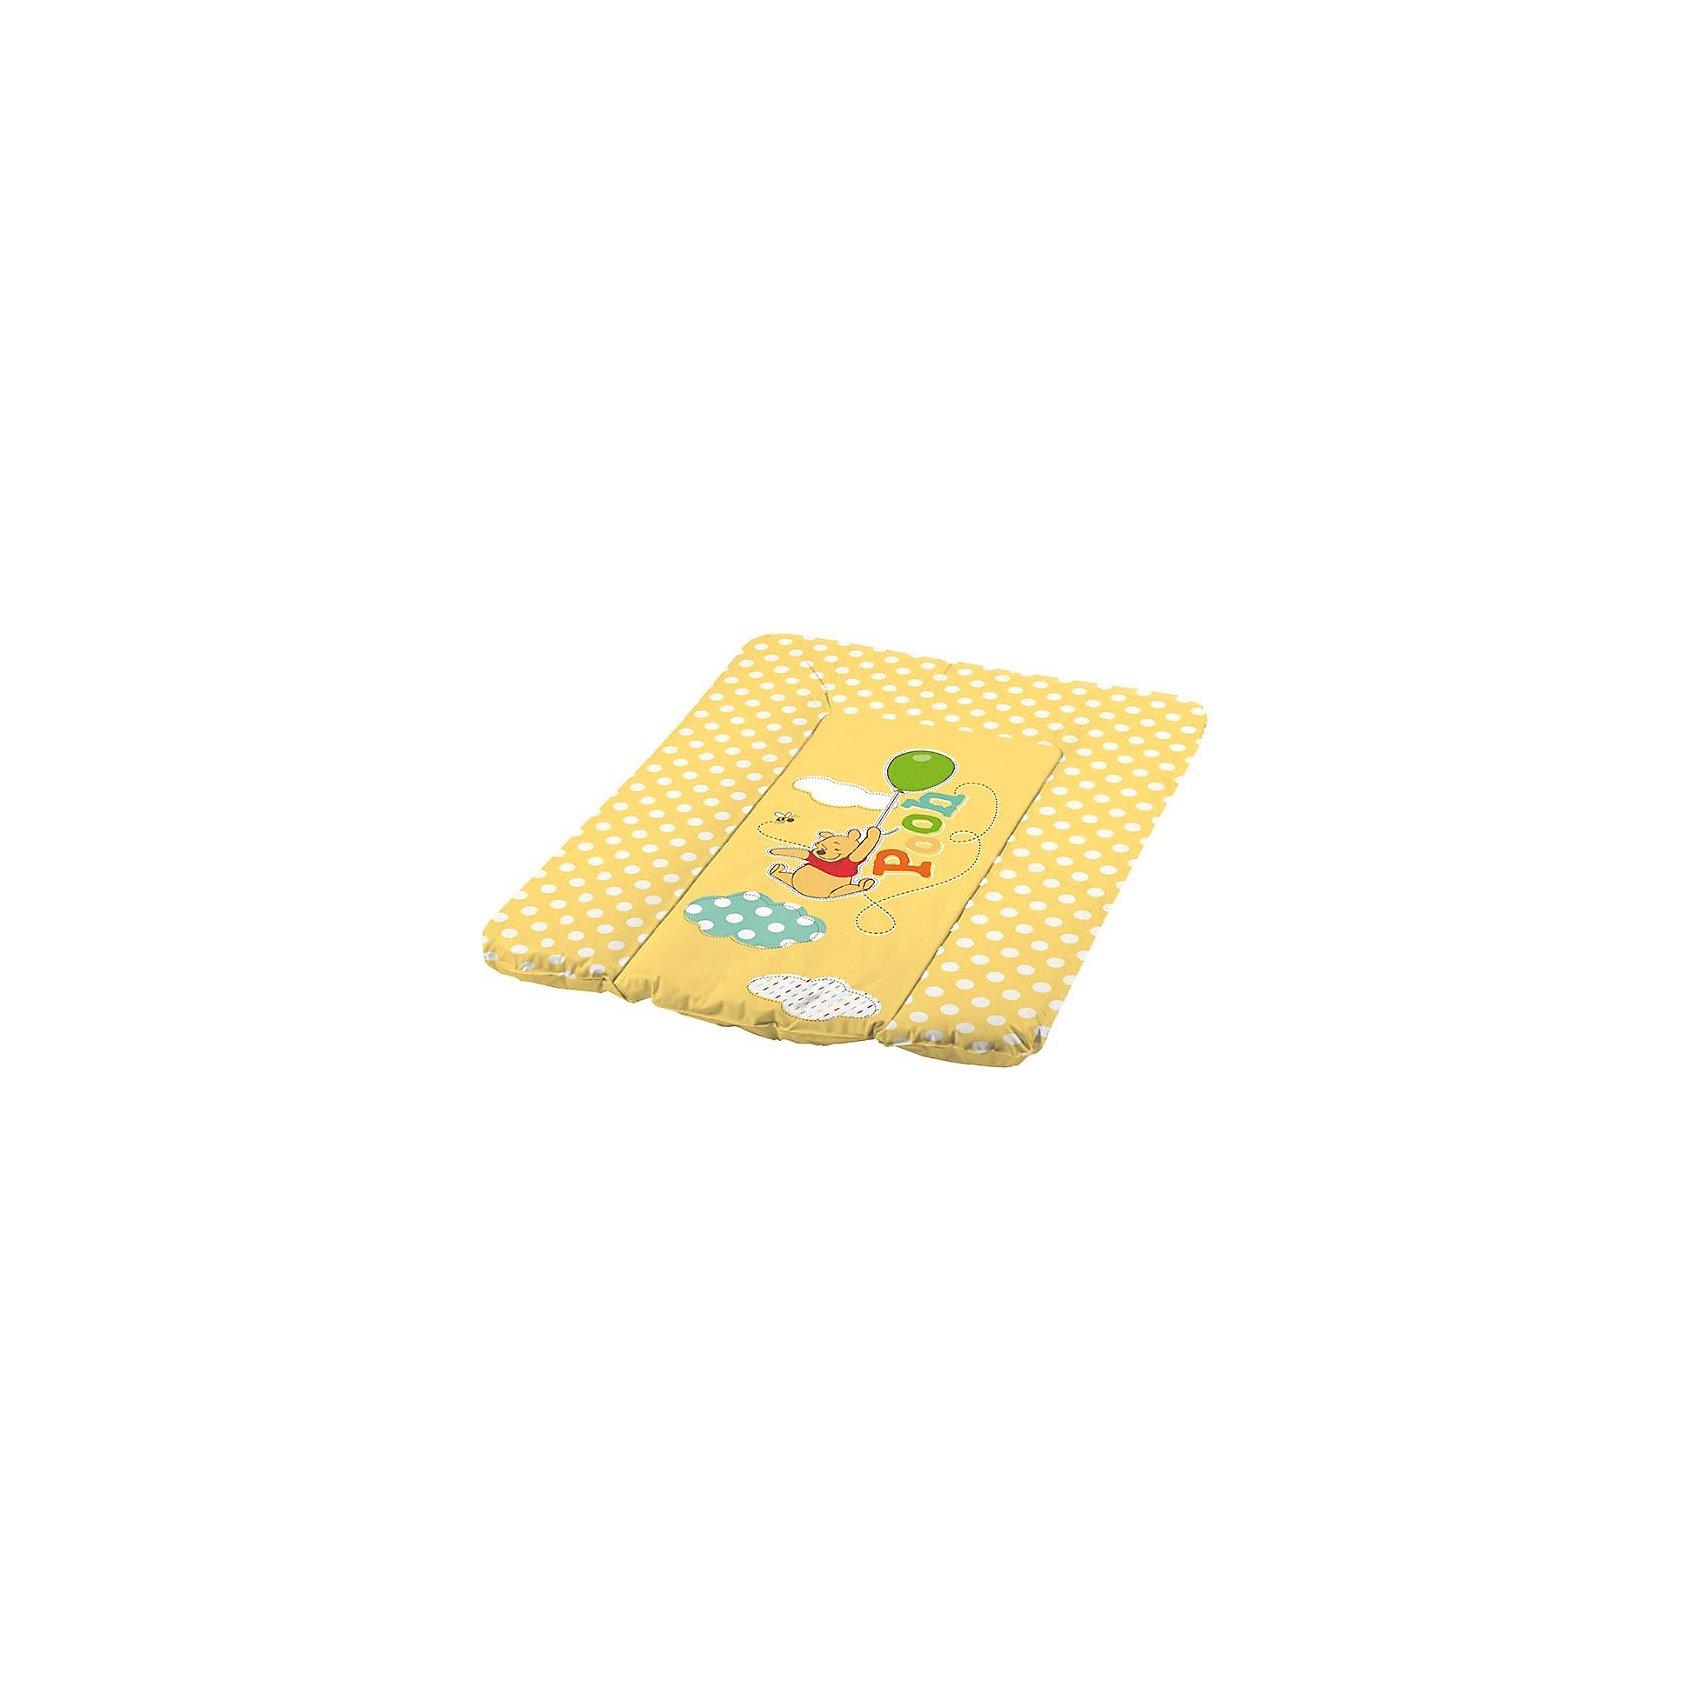 OKT kids Матрас для пеленания DISNEY Винни-Пух, OKT kids, жёлтый okt подставка disney винни пух